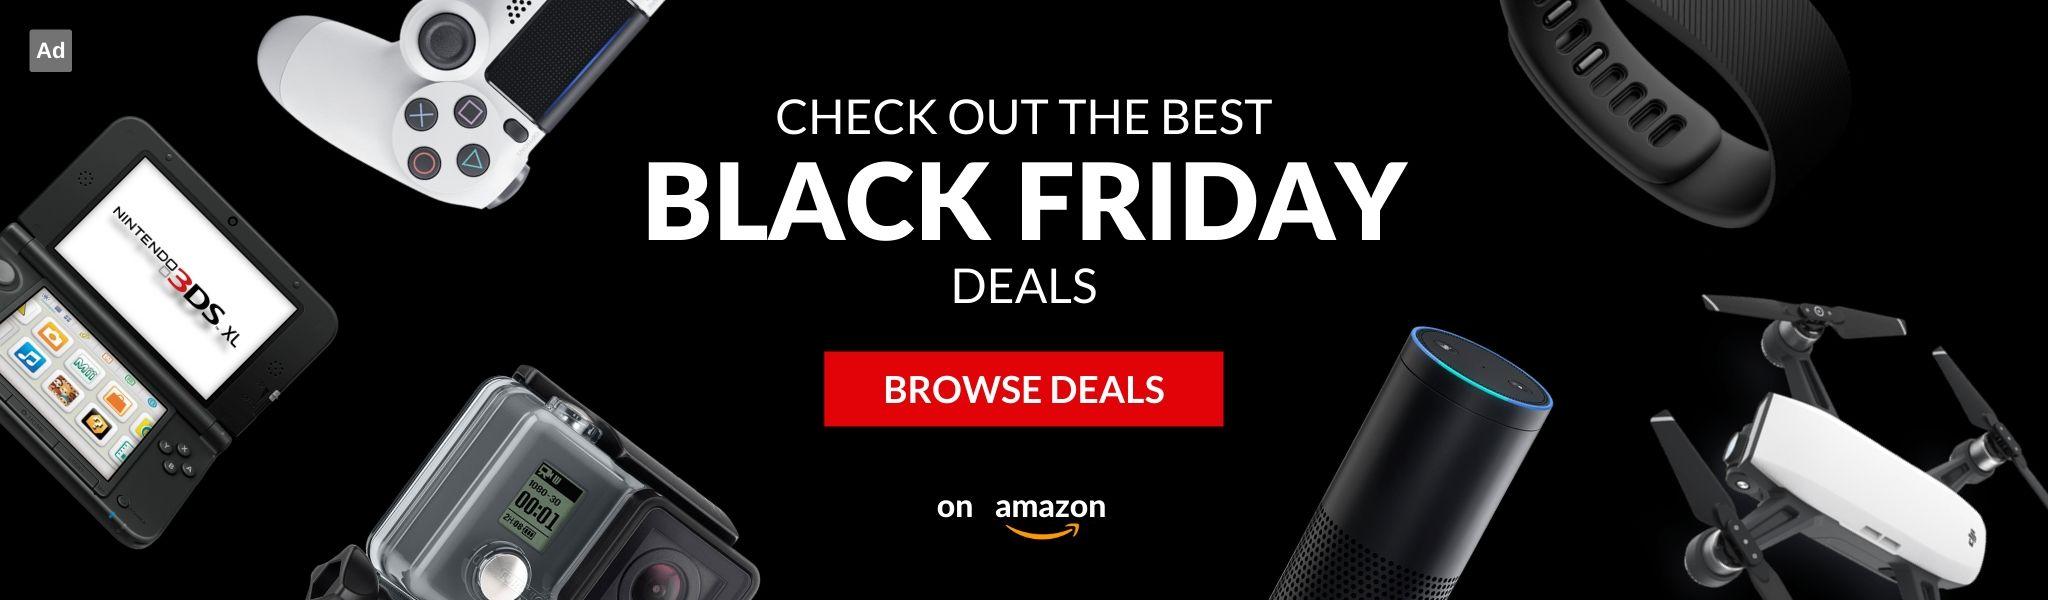 Best Black Friday Deals